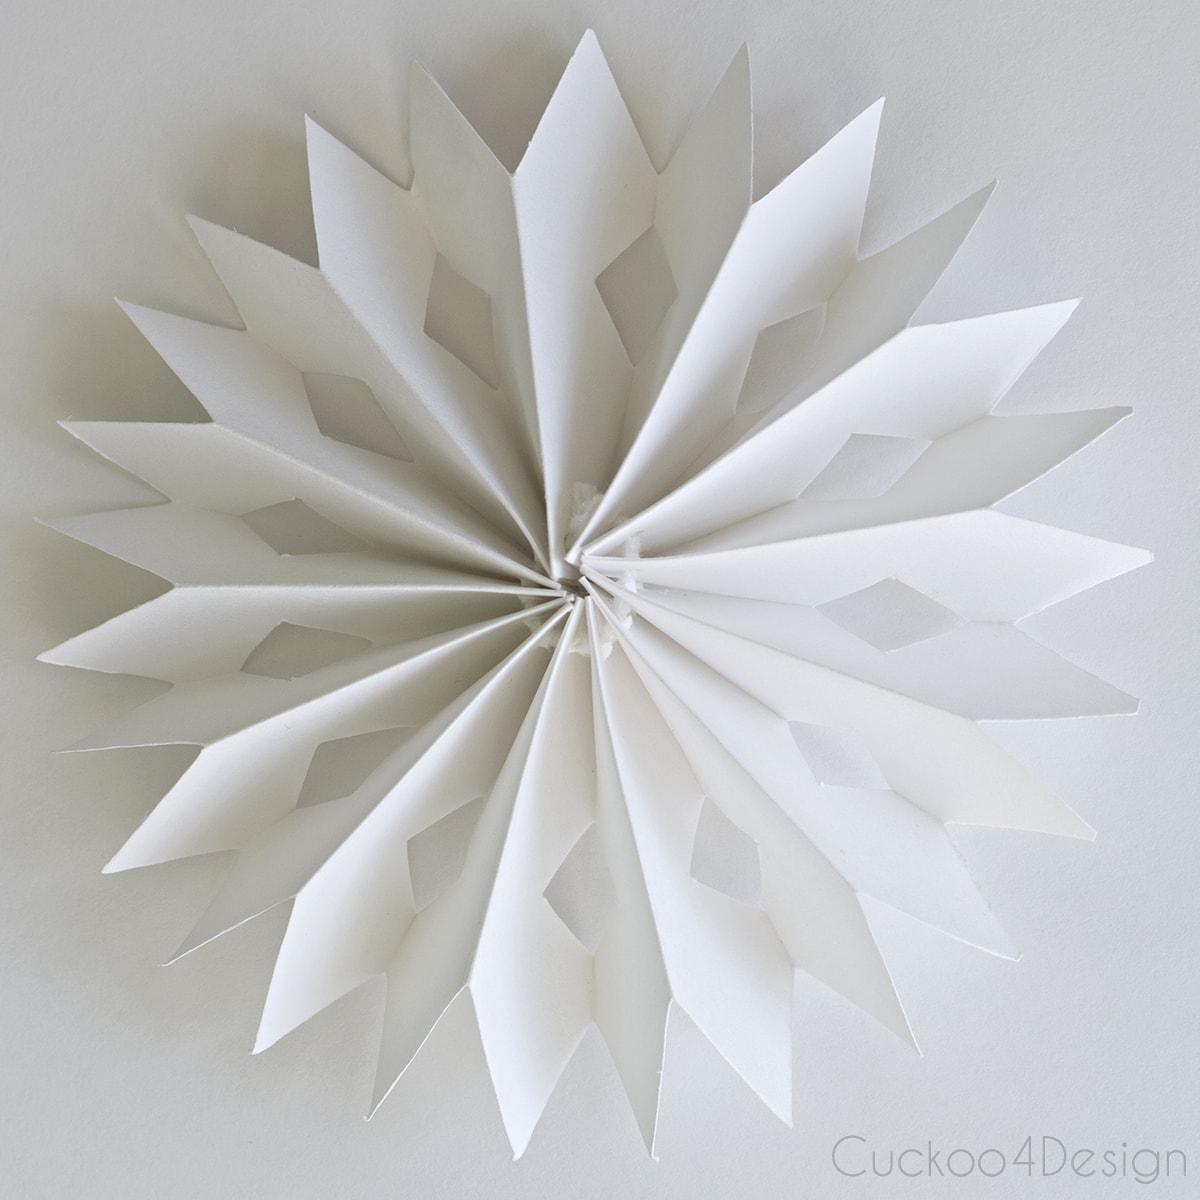 diy_cardboard_snowflake_ornament_cuckoo4design_3